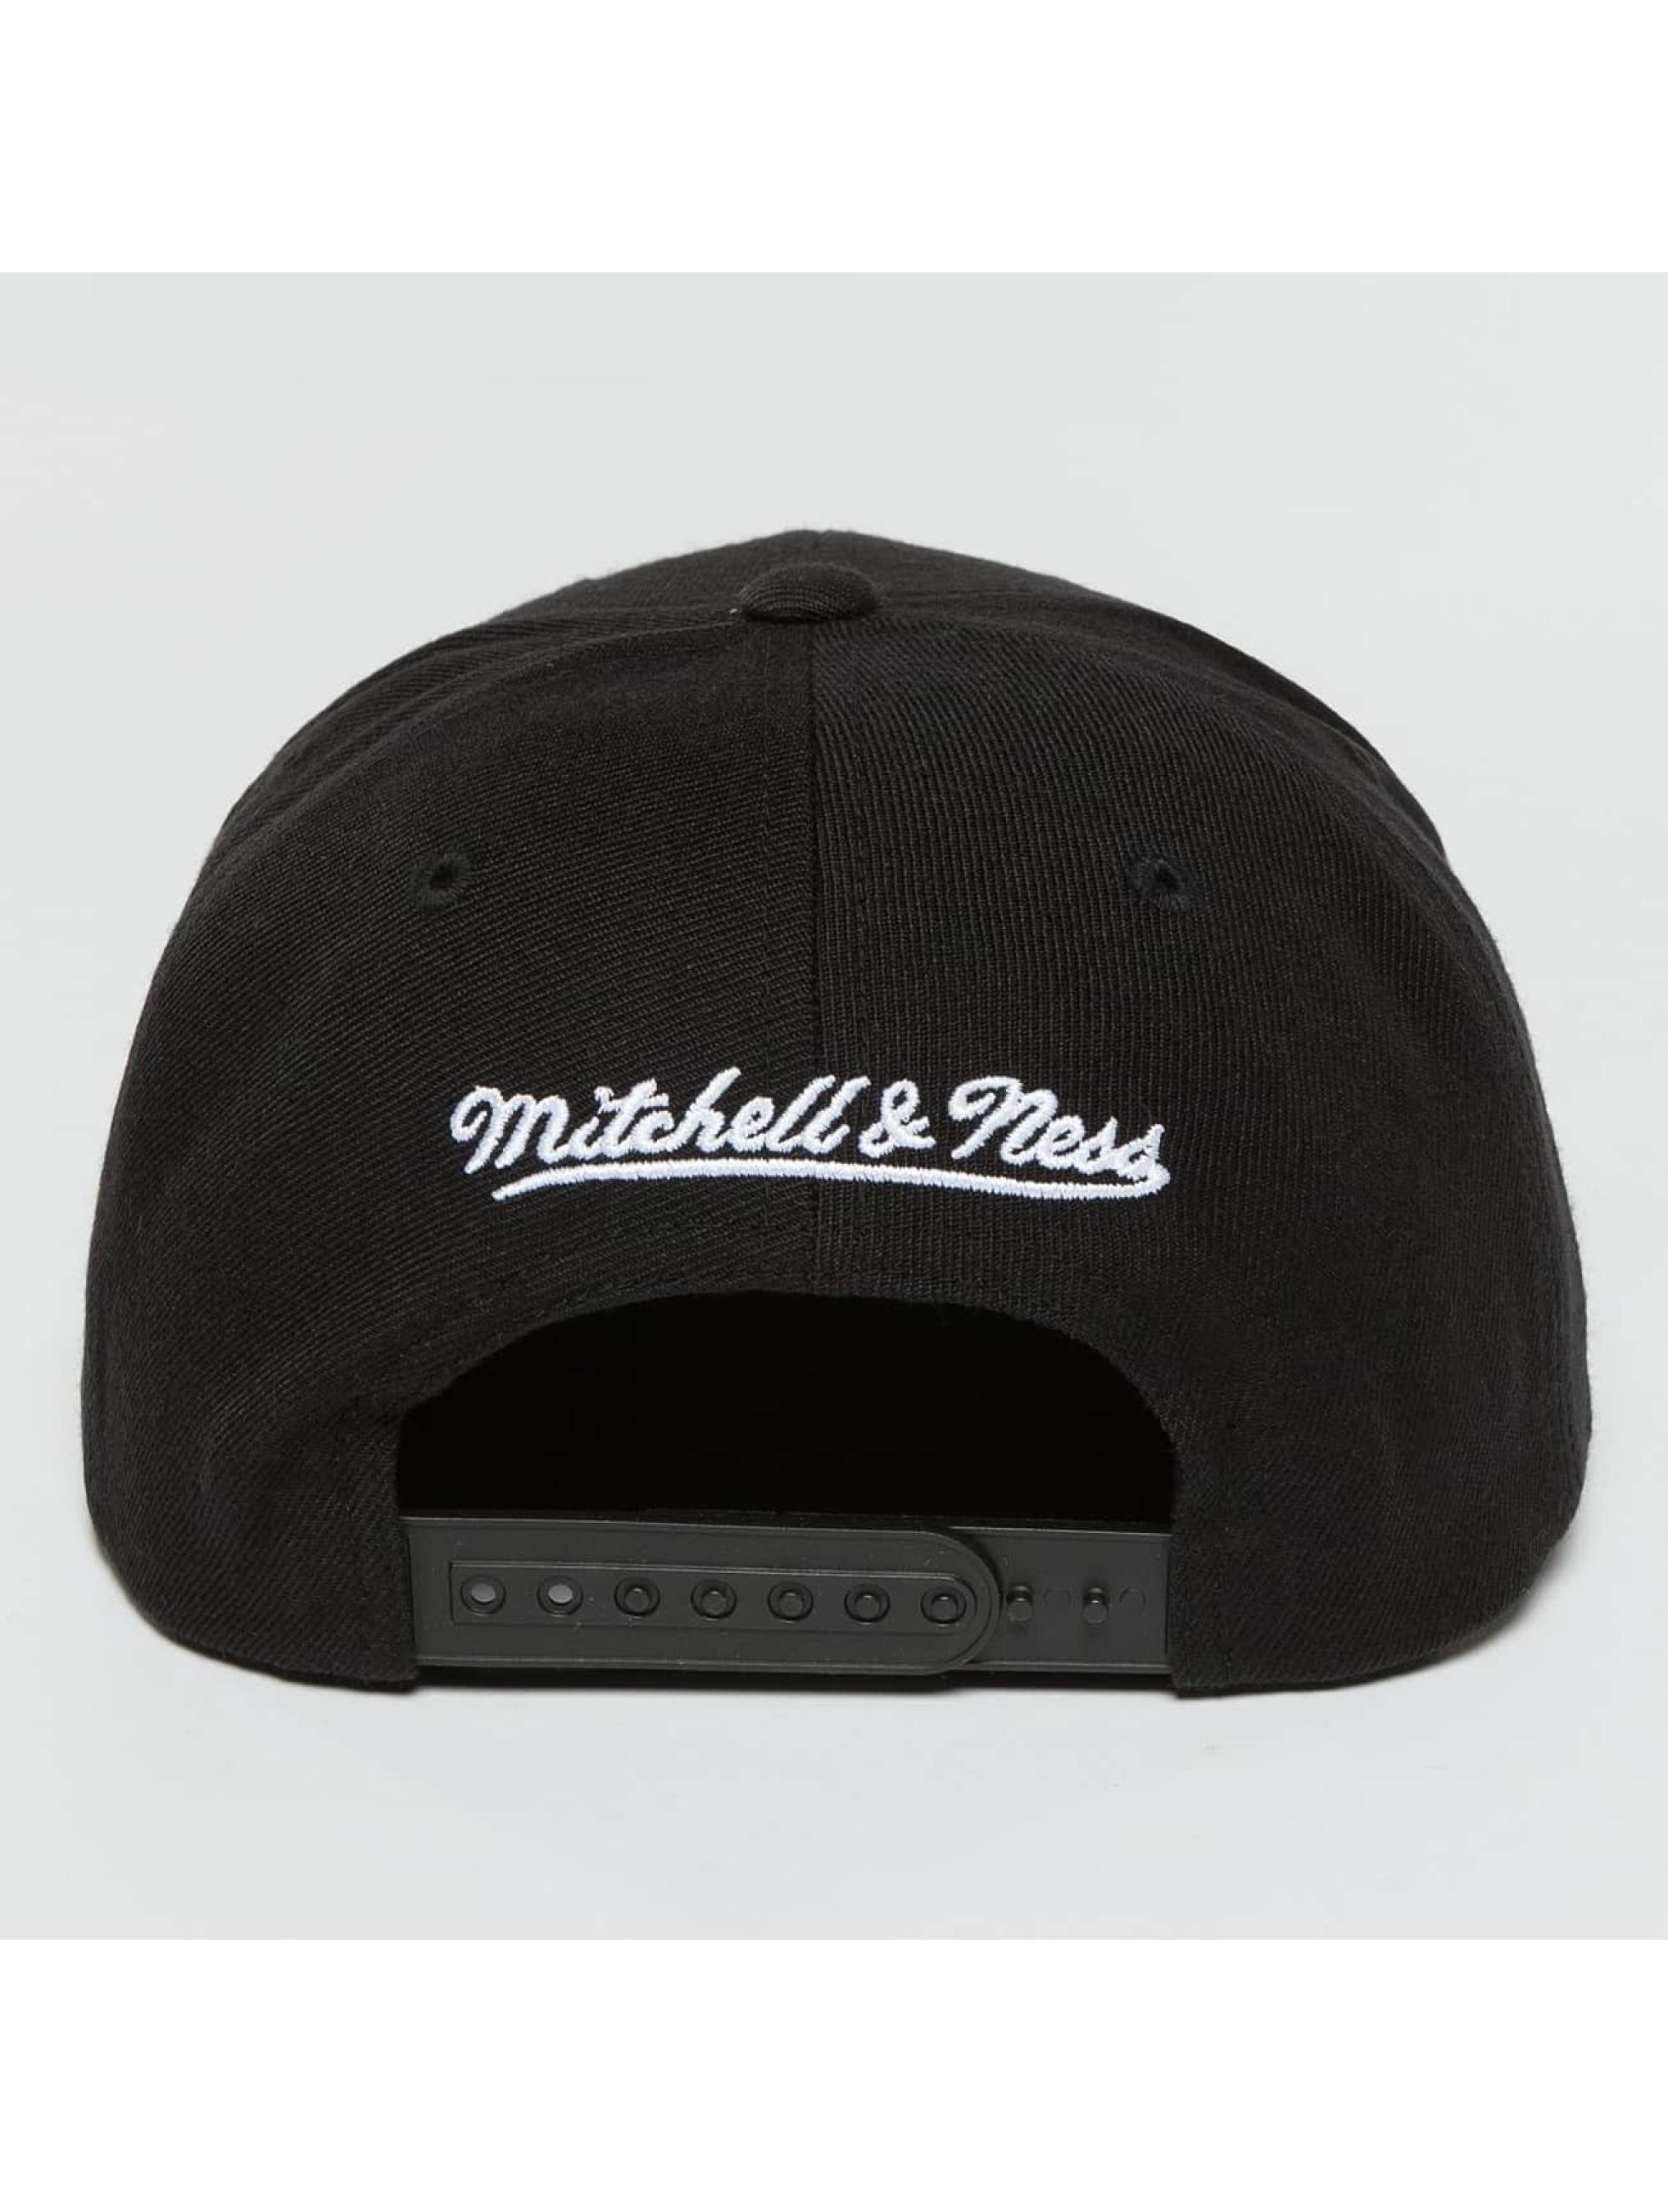 Mitchell & Ness Snapback Cap Full Dollar Golden State Warriors schwarz